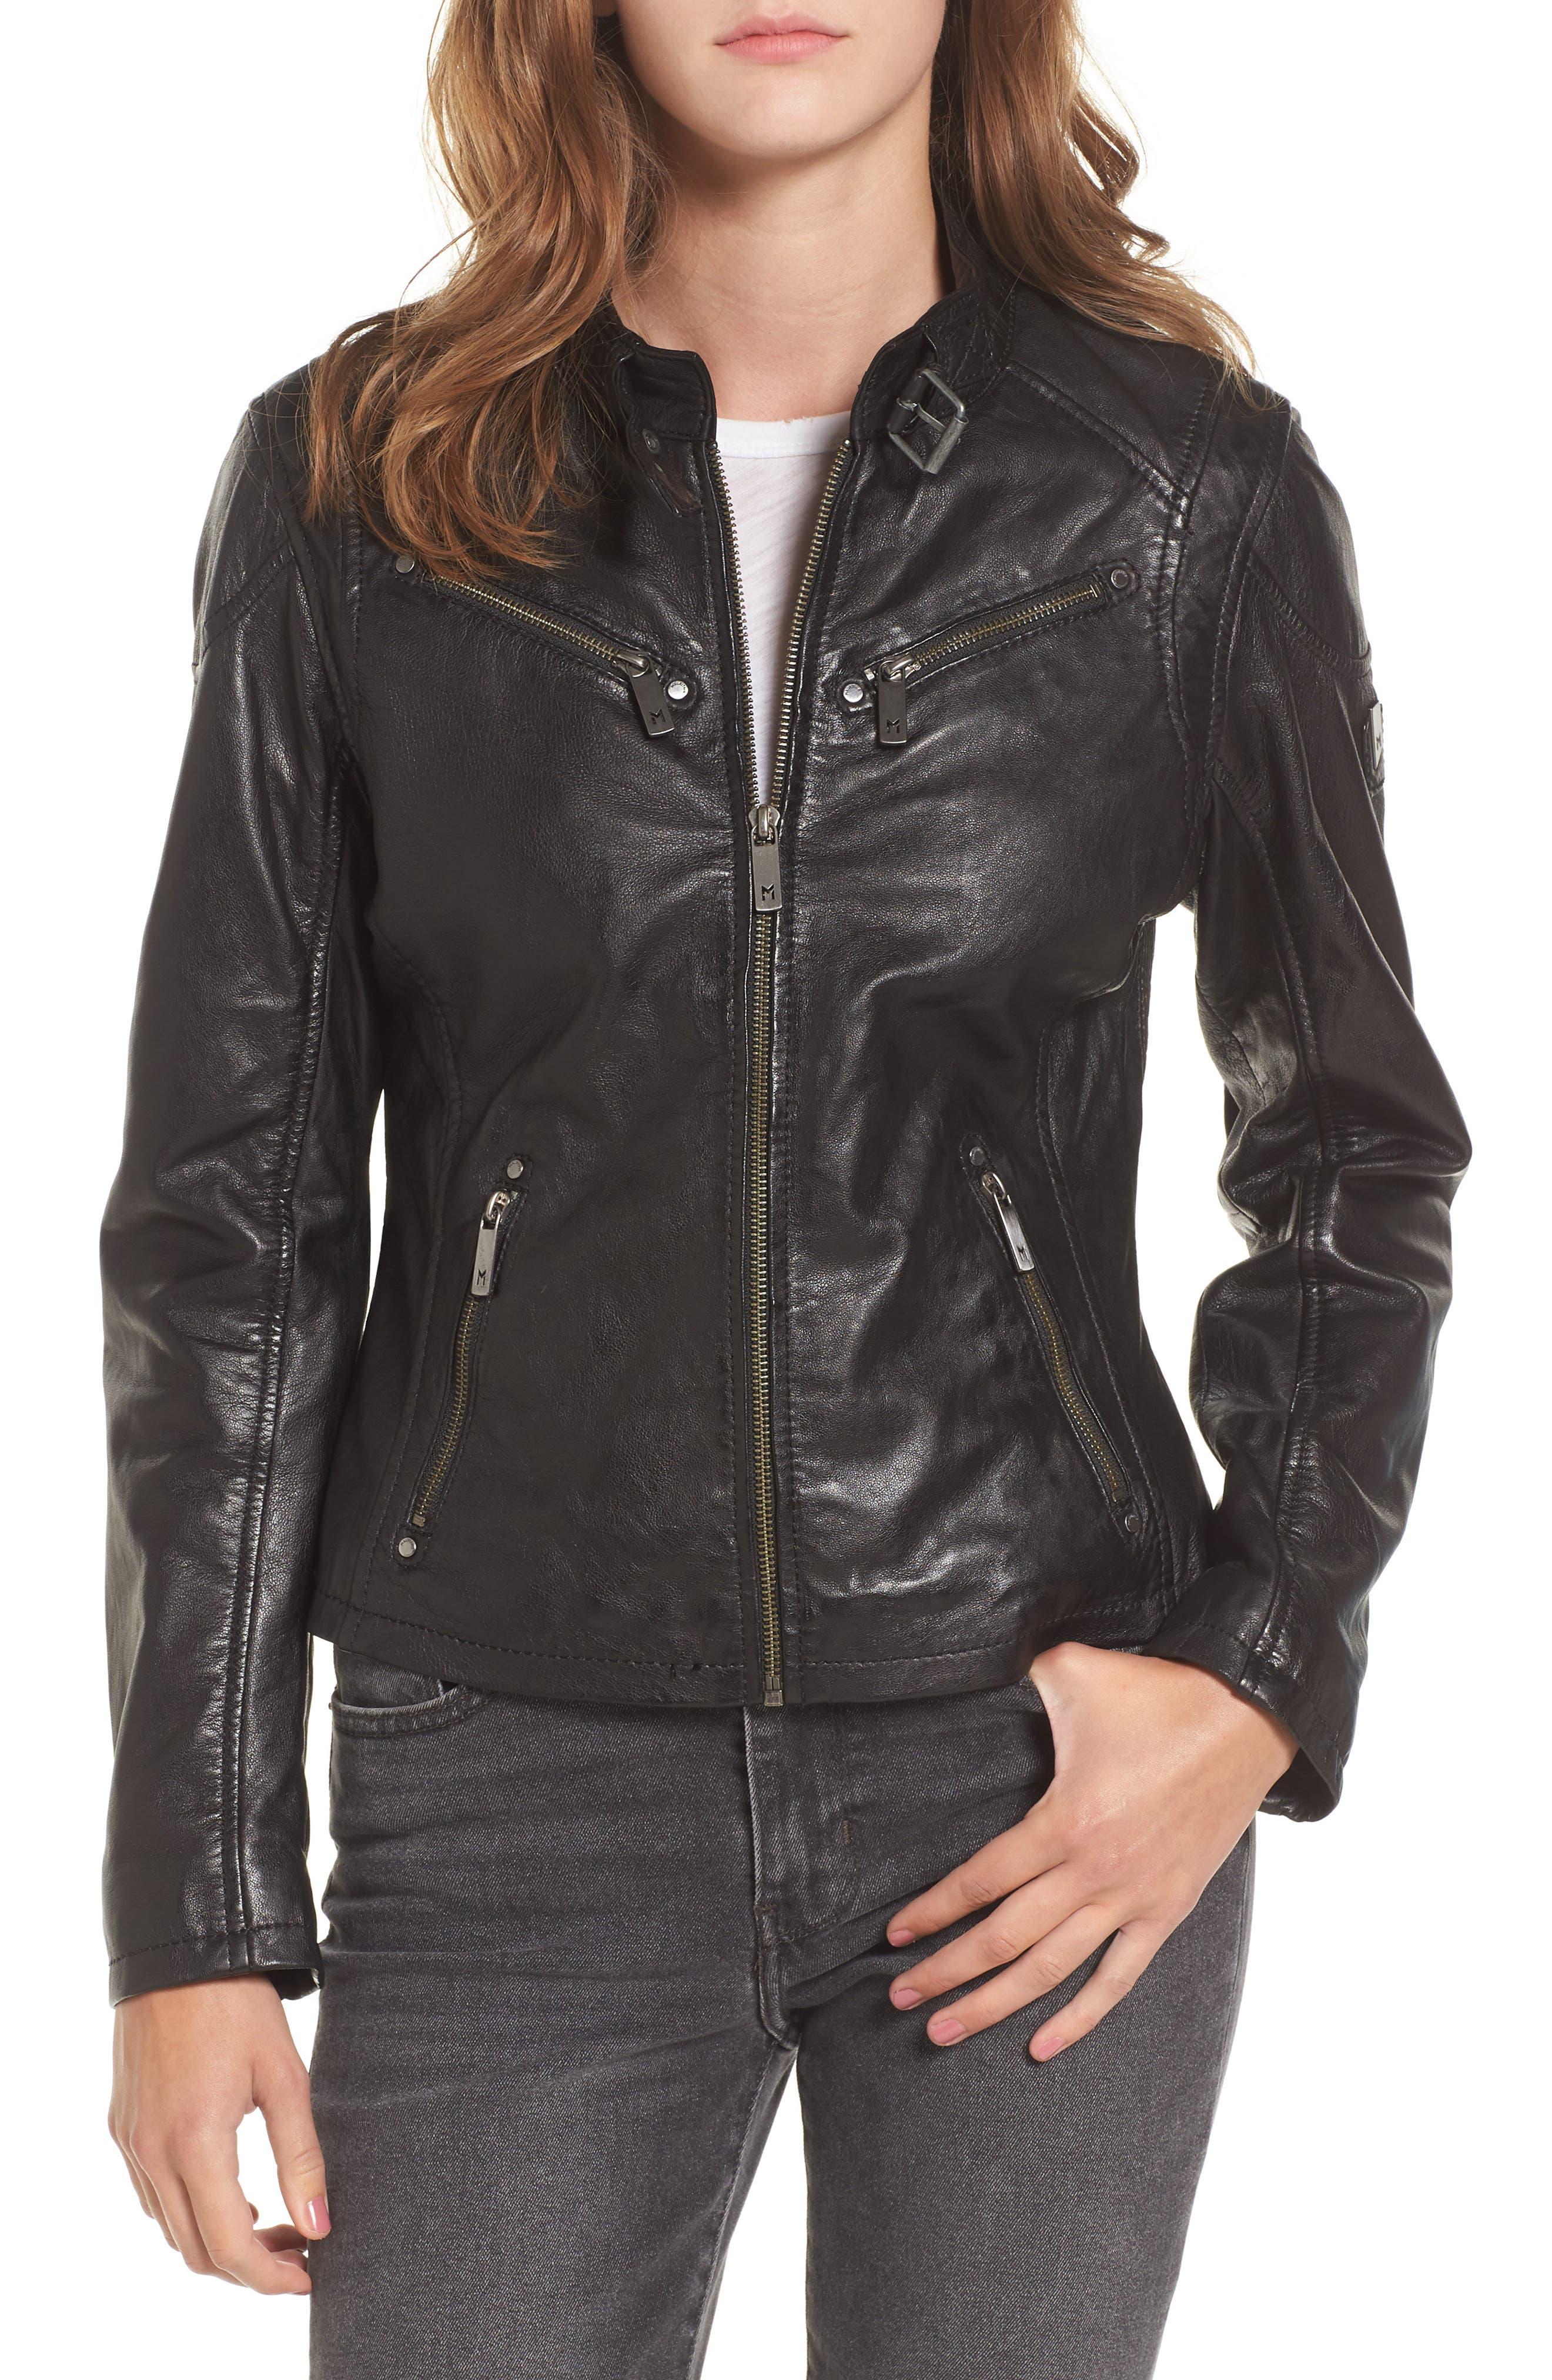 MAURITIUS, Leather Lambskin Leather Moto Jacket, Main thumbnail 1, color, 001